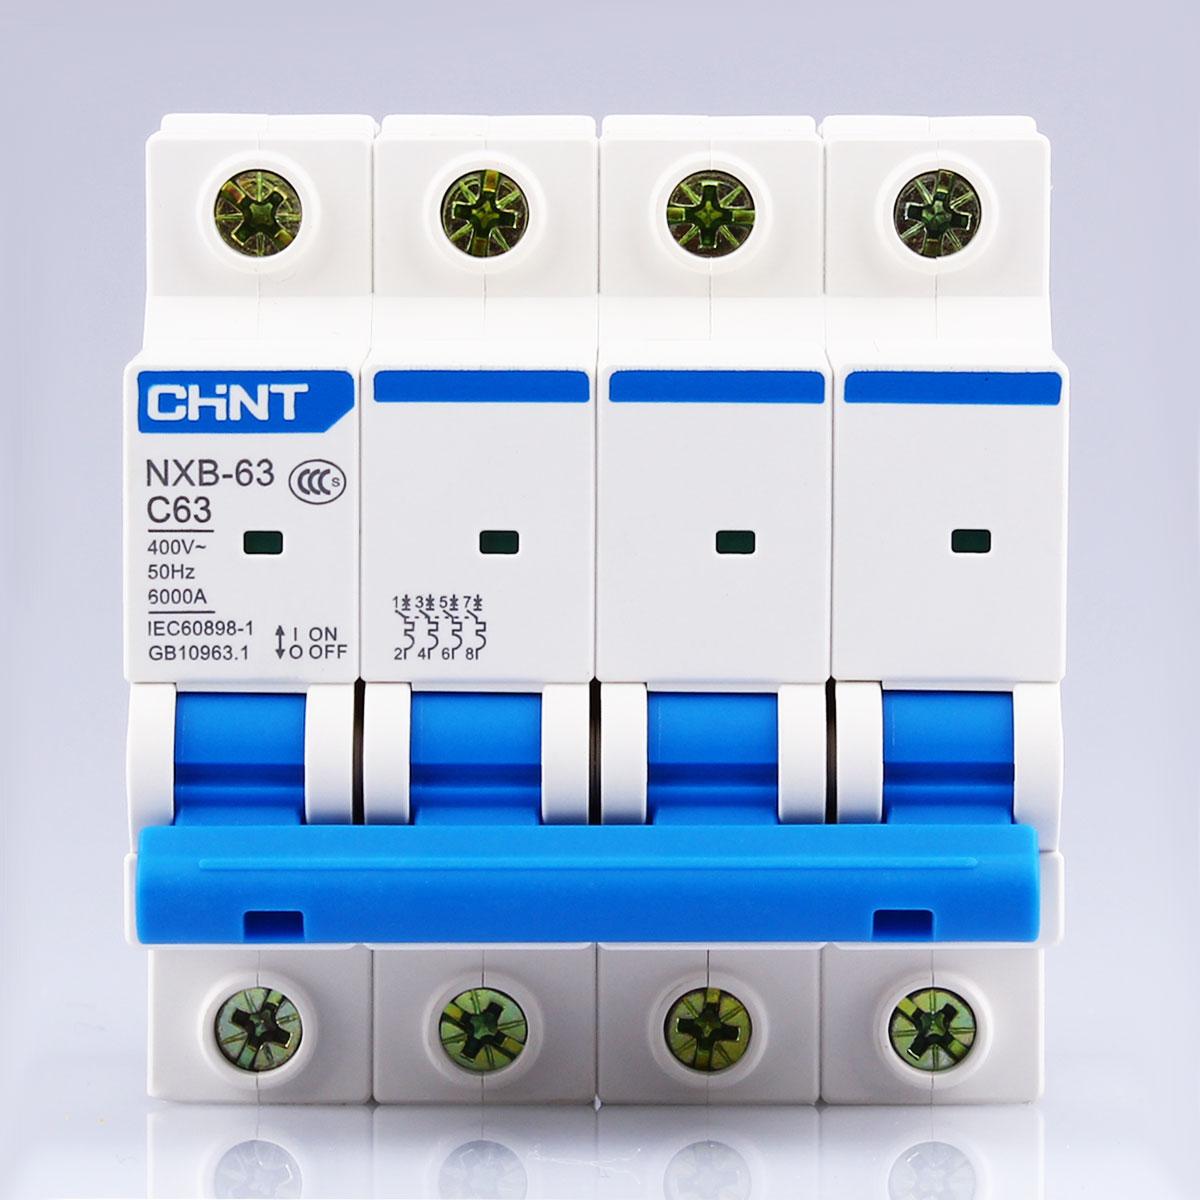 CHNT CHINT NXB-63 4P 1A 2A 3A 6A 10A 16A 20A 25A 32A 40A 63A 230V 380V Miniature Circuit breaker MCB NEW DZ47